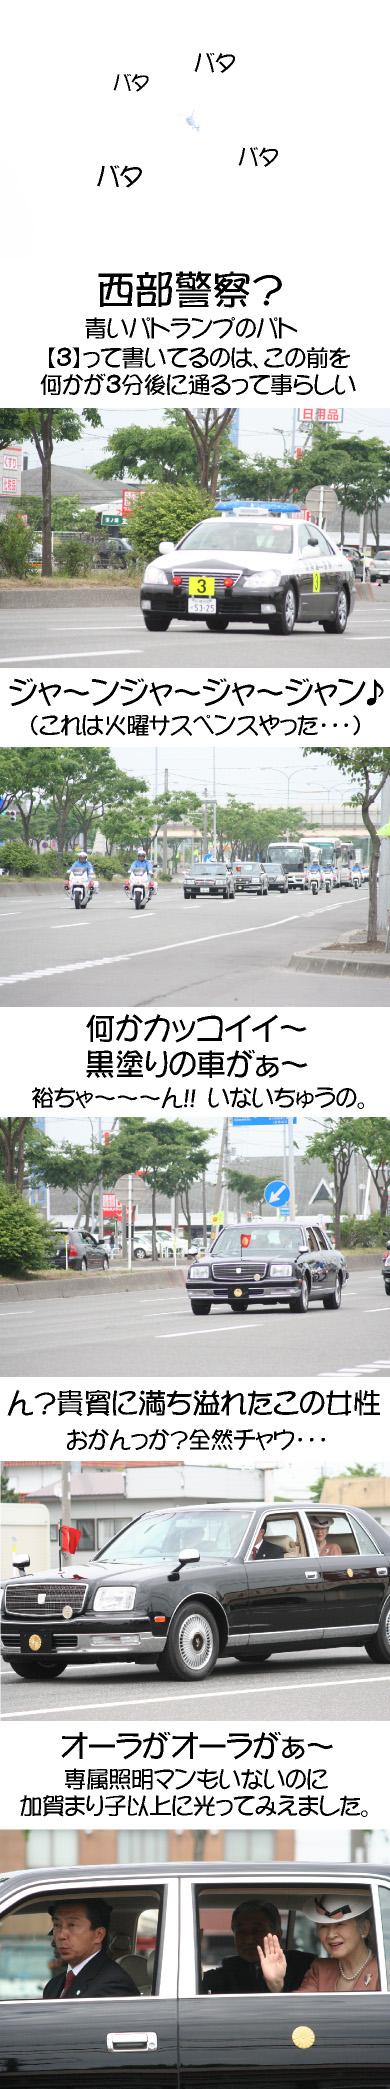 2007.6.24a.jpg